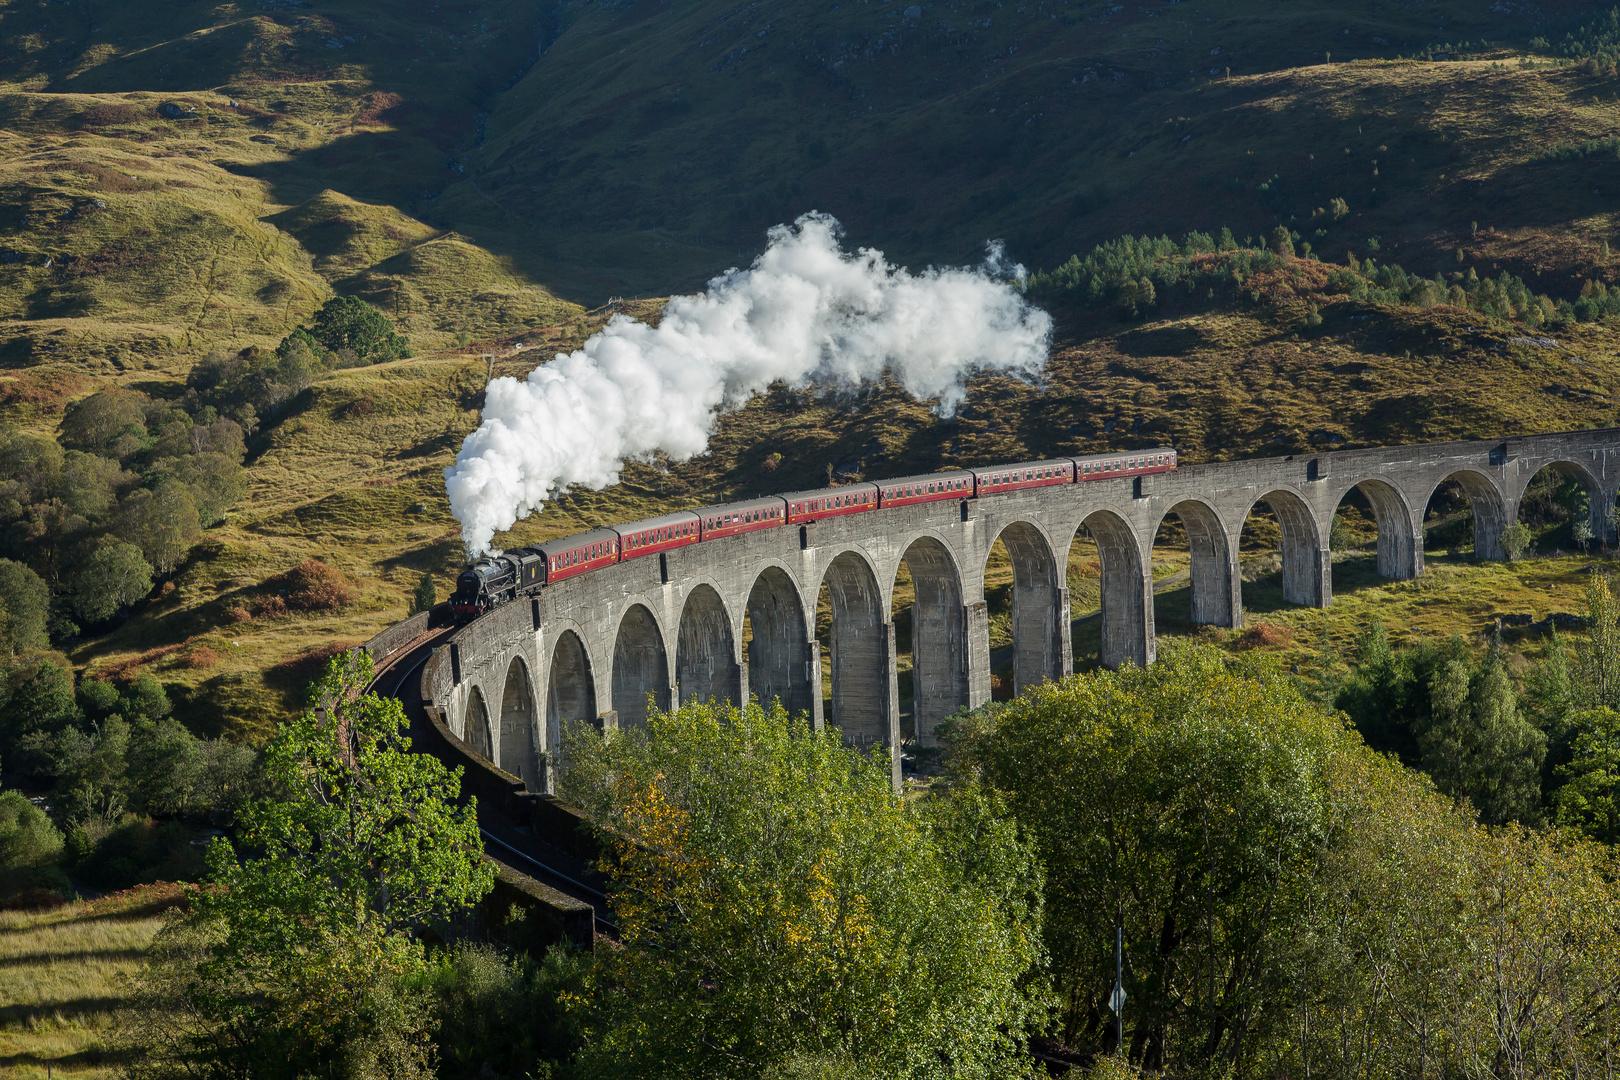 The Jacobite Steam Train - Harry Potter lässt grüssen